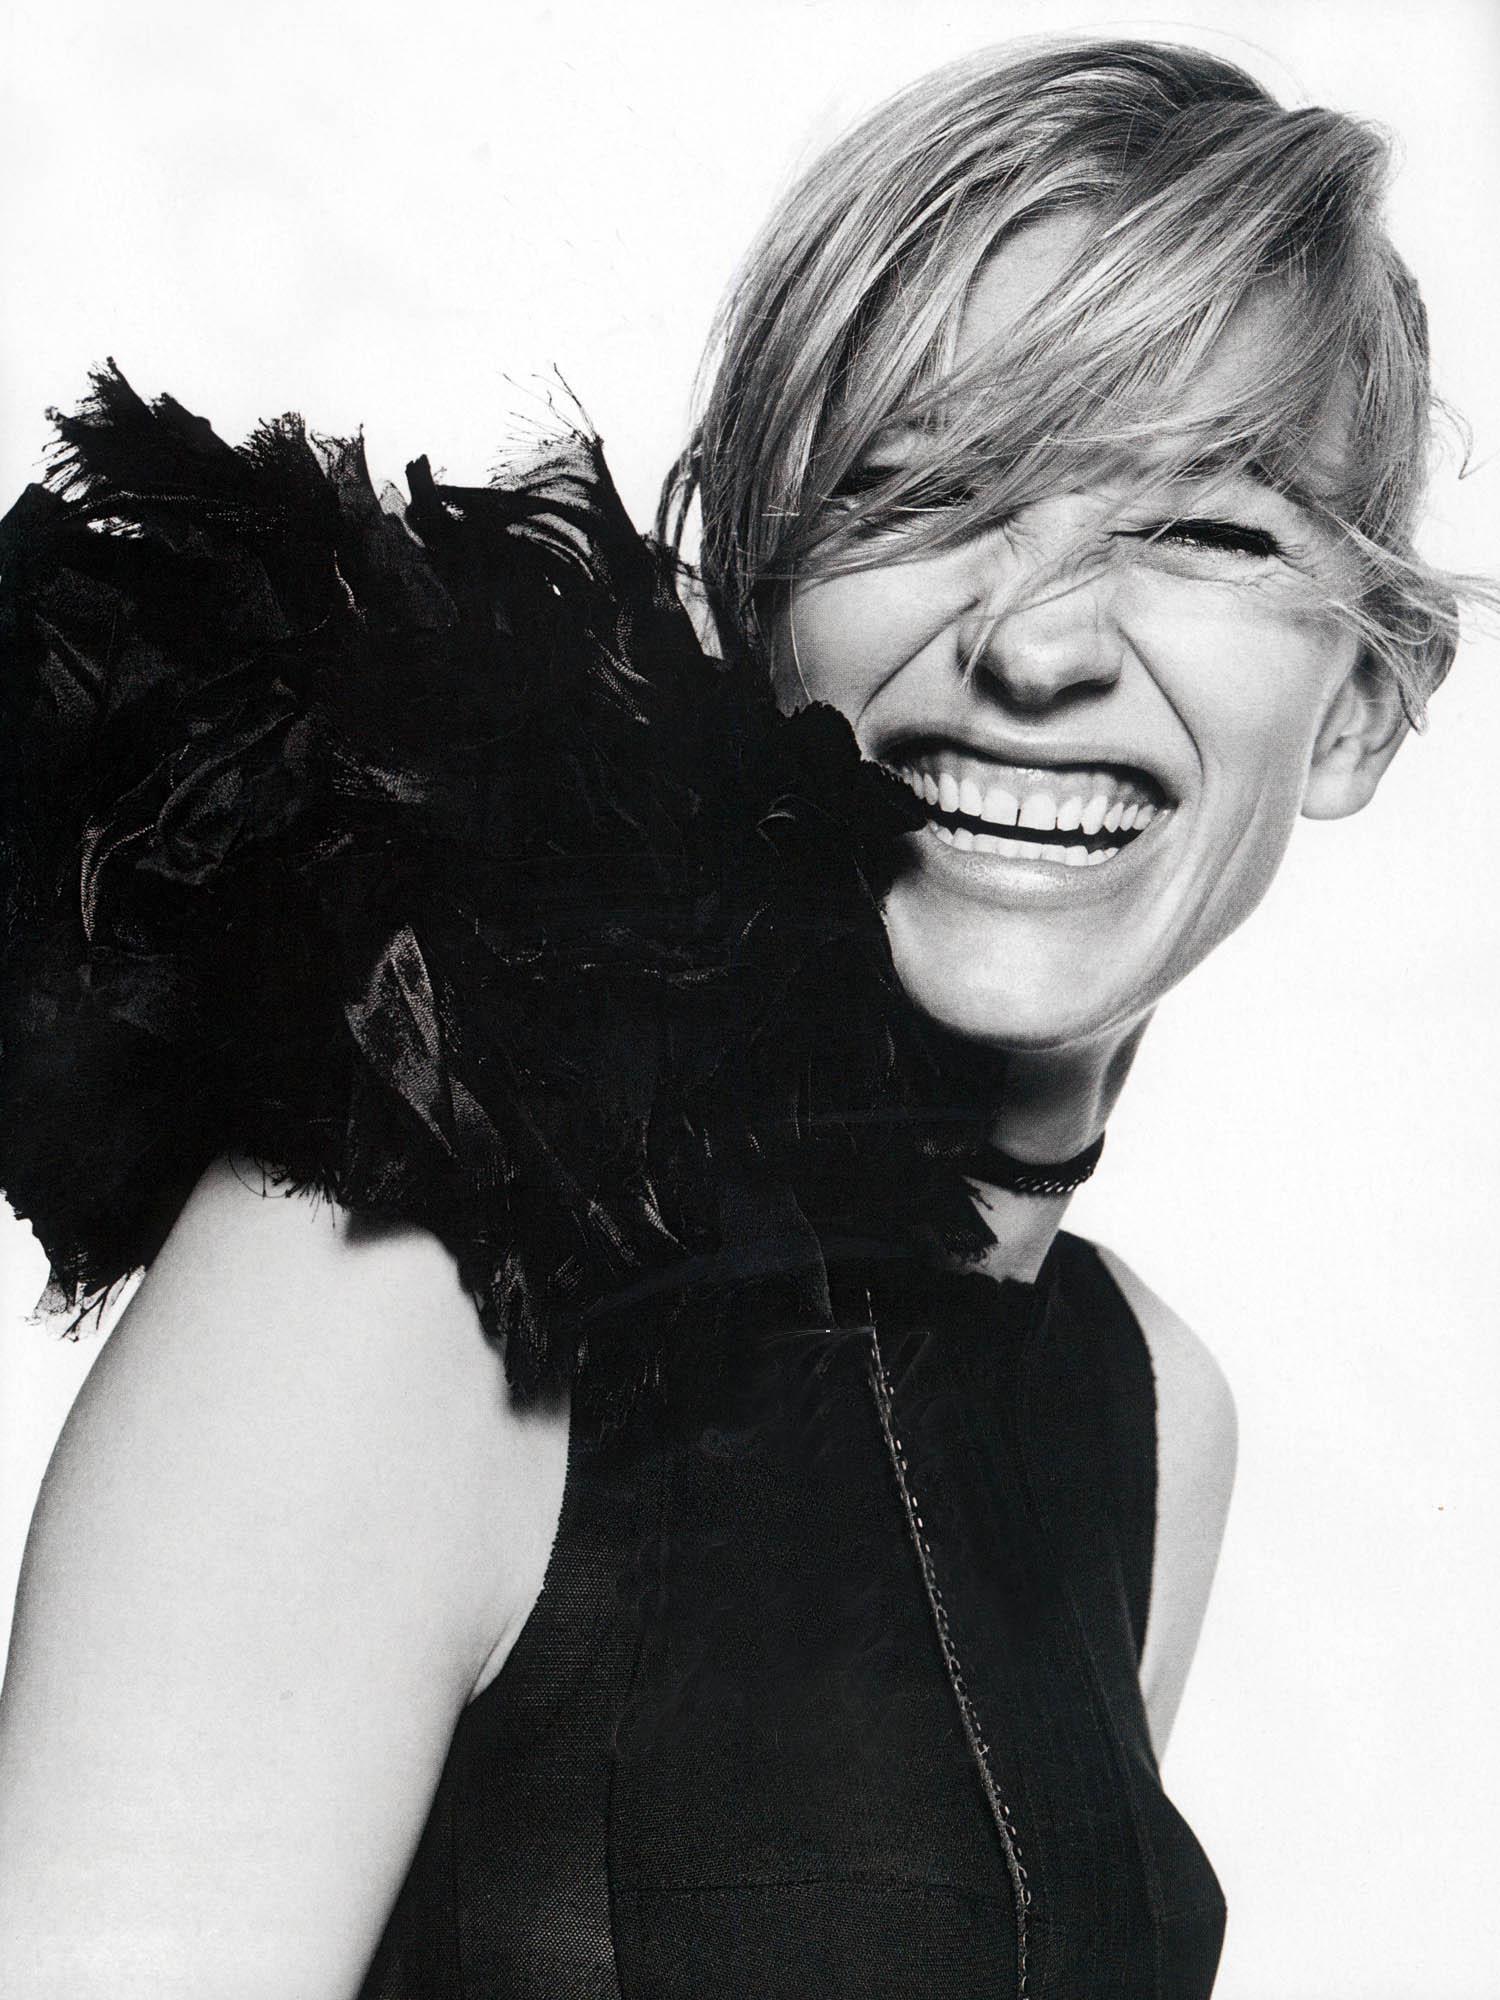 fotos de Cate Blanchett sin ropa